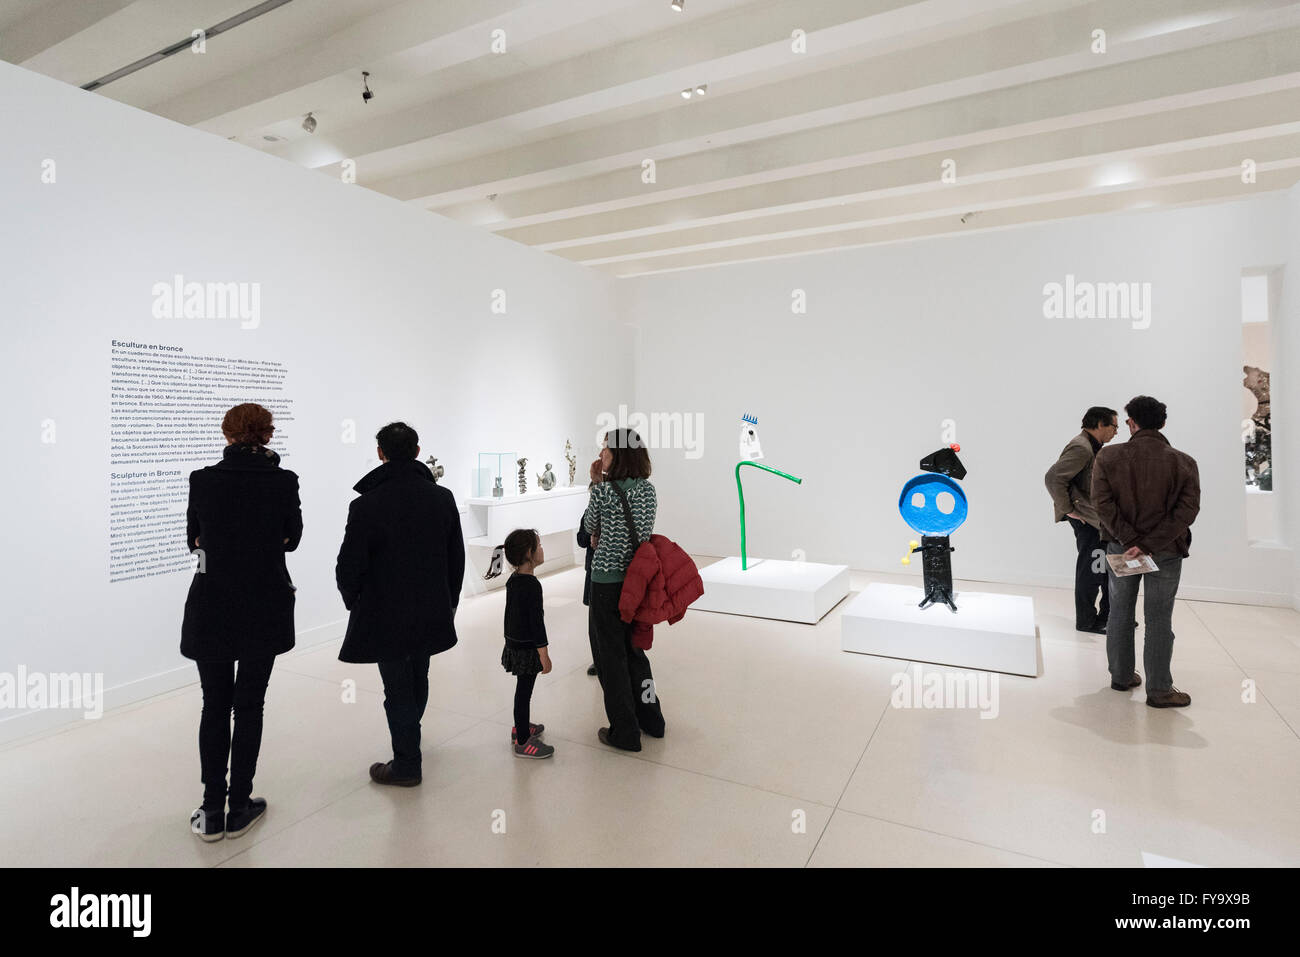 Madrid. Spain. CaixaForum Madrid, visitors at a Joan Miró exhibition. - Stock Image